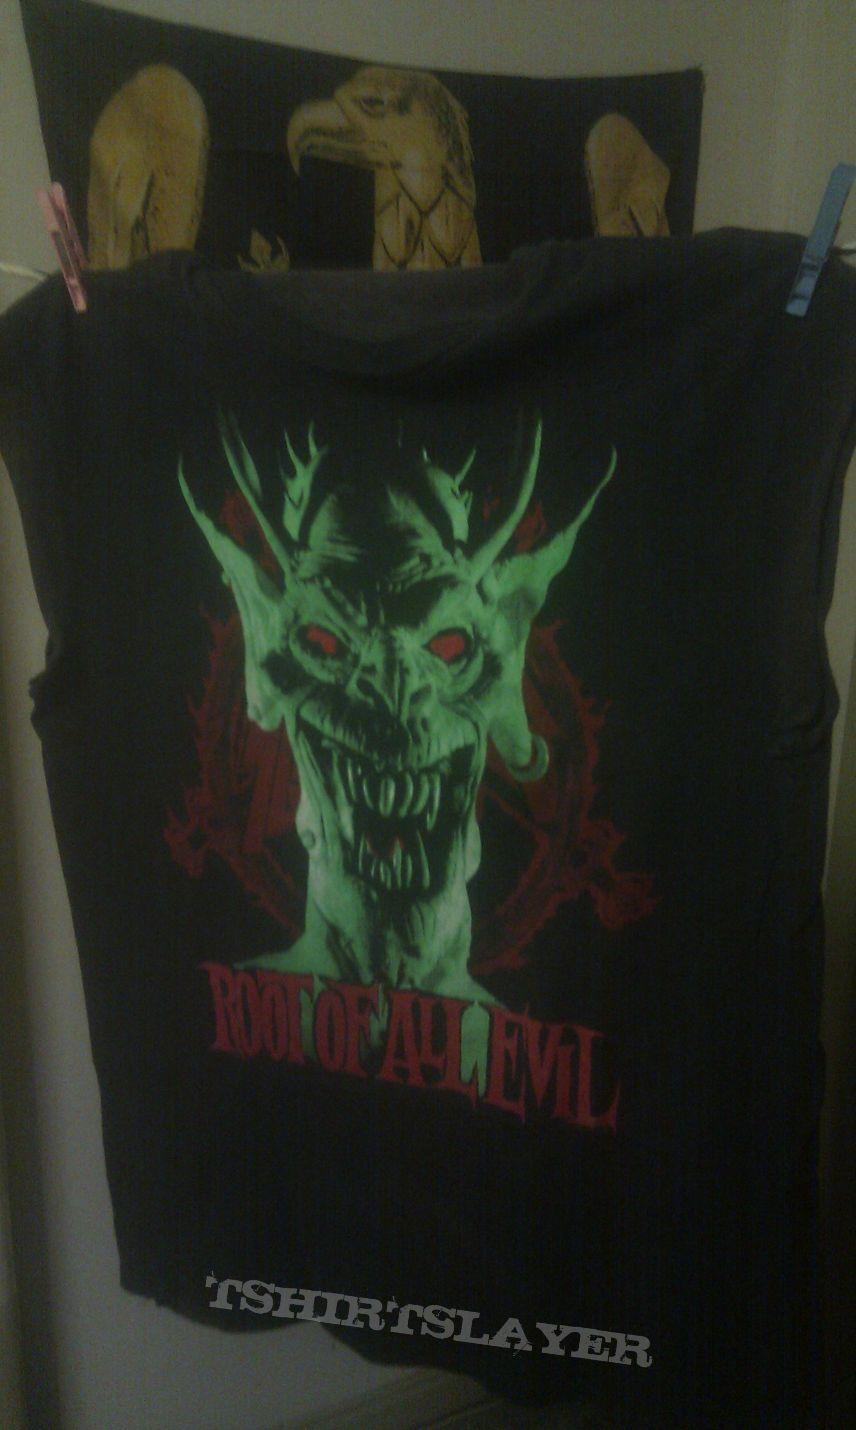 Slayer - Root of all evil / green demon muscleshirt